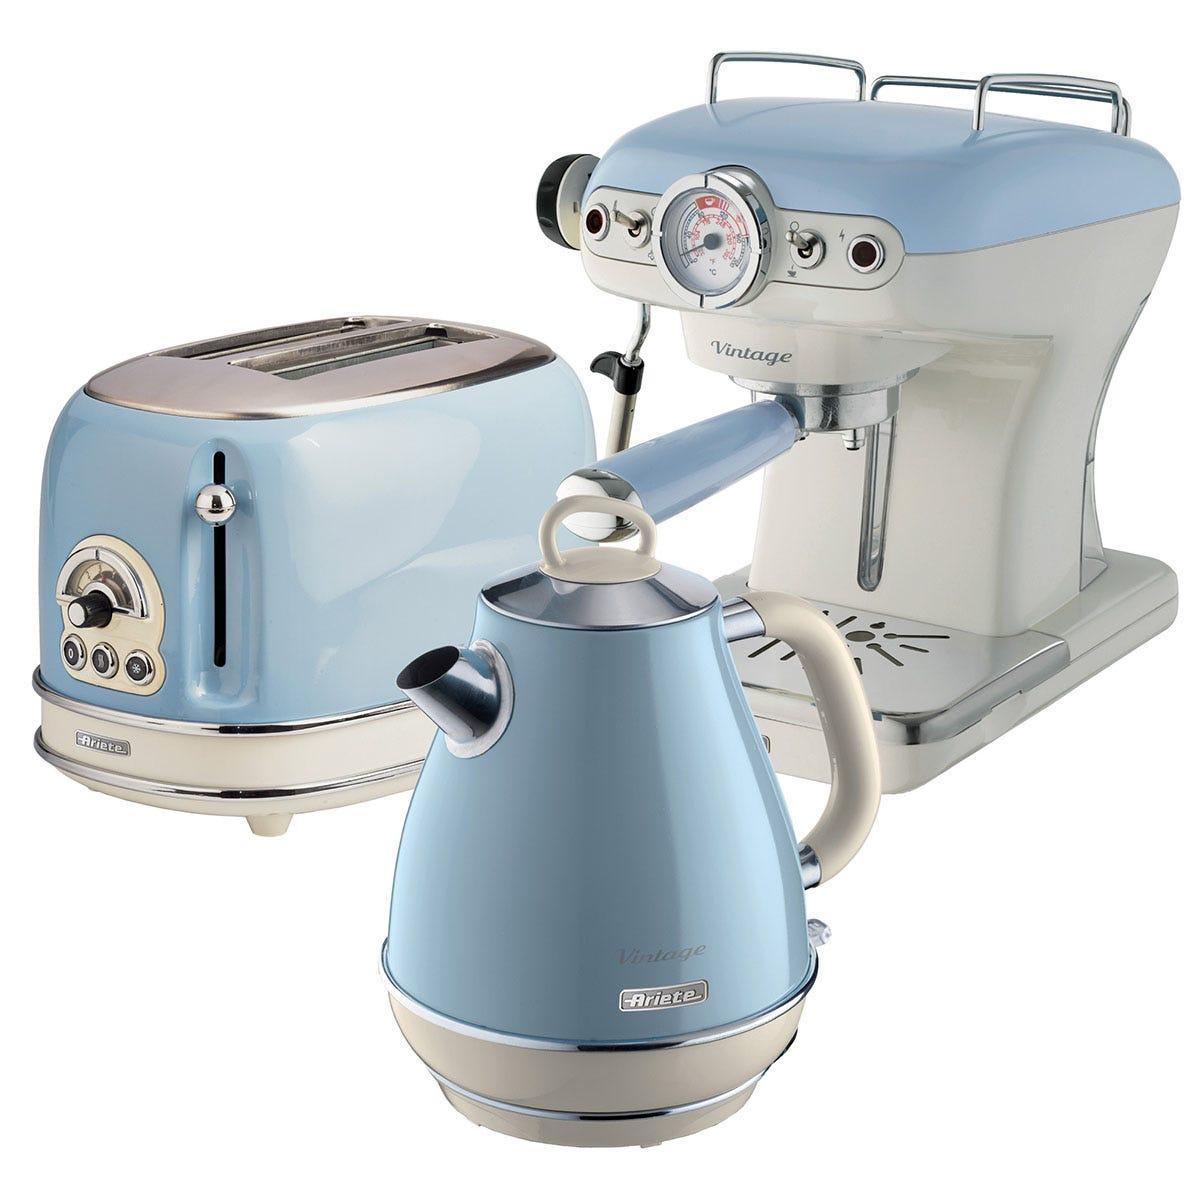 Ariete ARPK6 Vintage 2-Slice Toaster, 1.7L Jug Kettle, and Espresso Coffee Maker - Blue